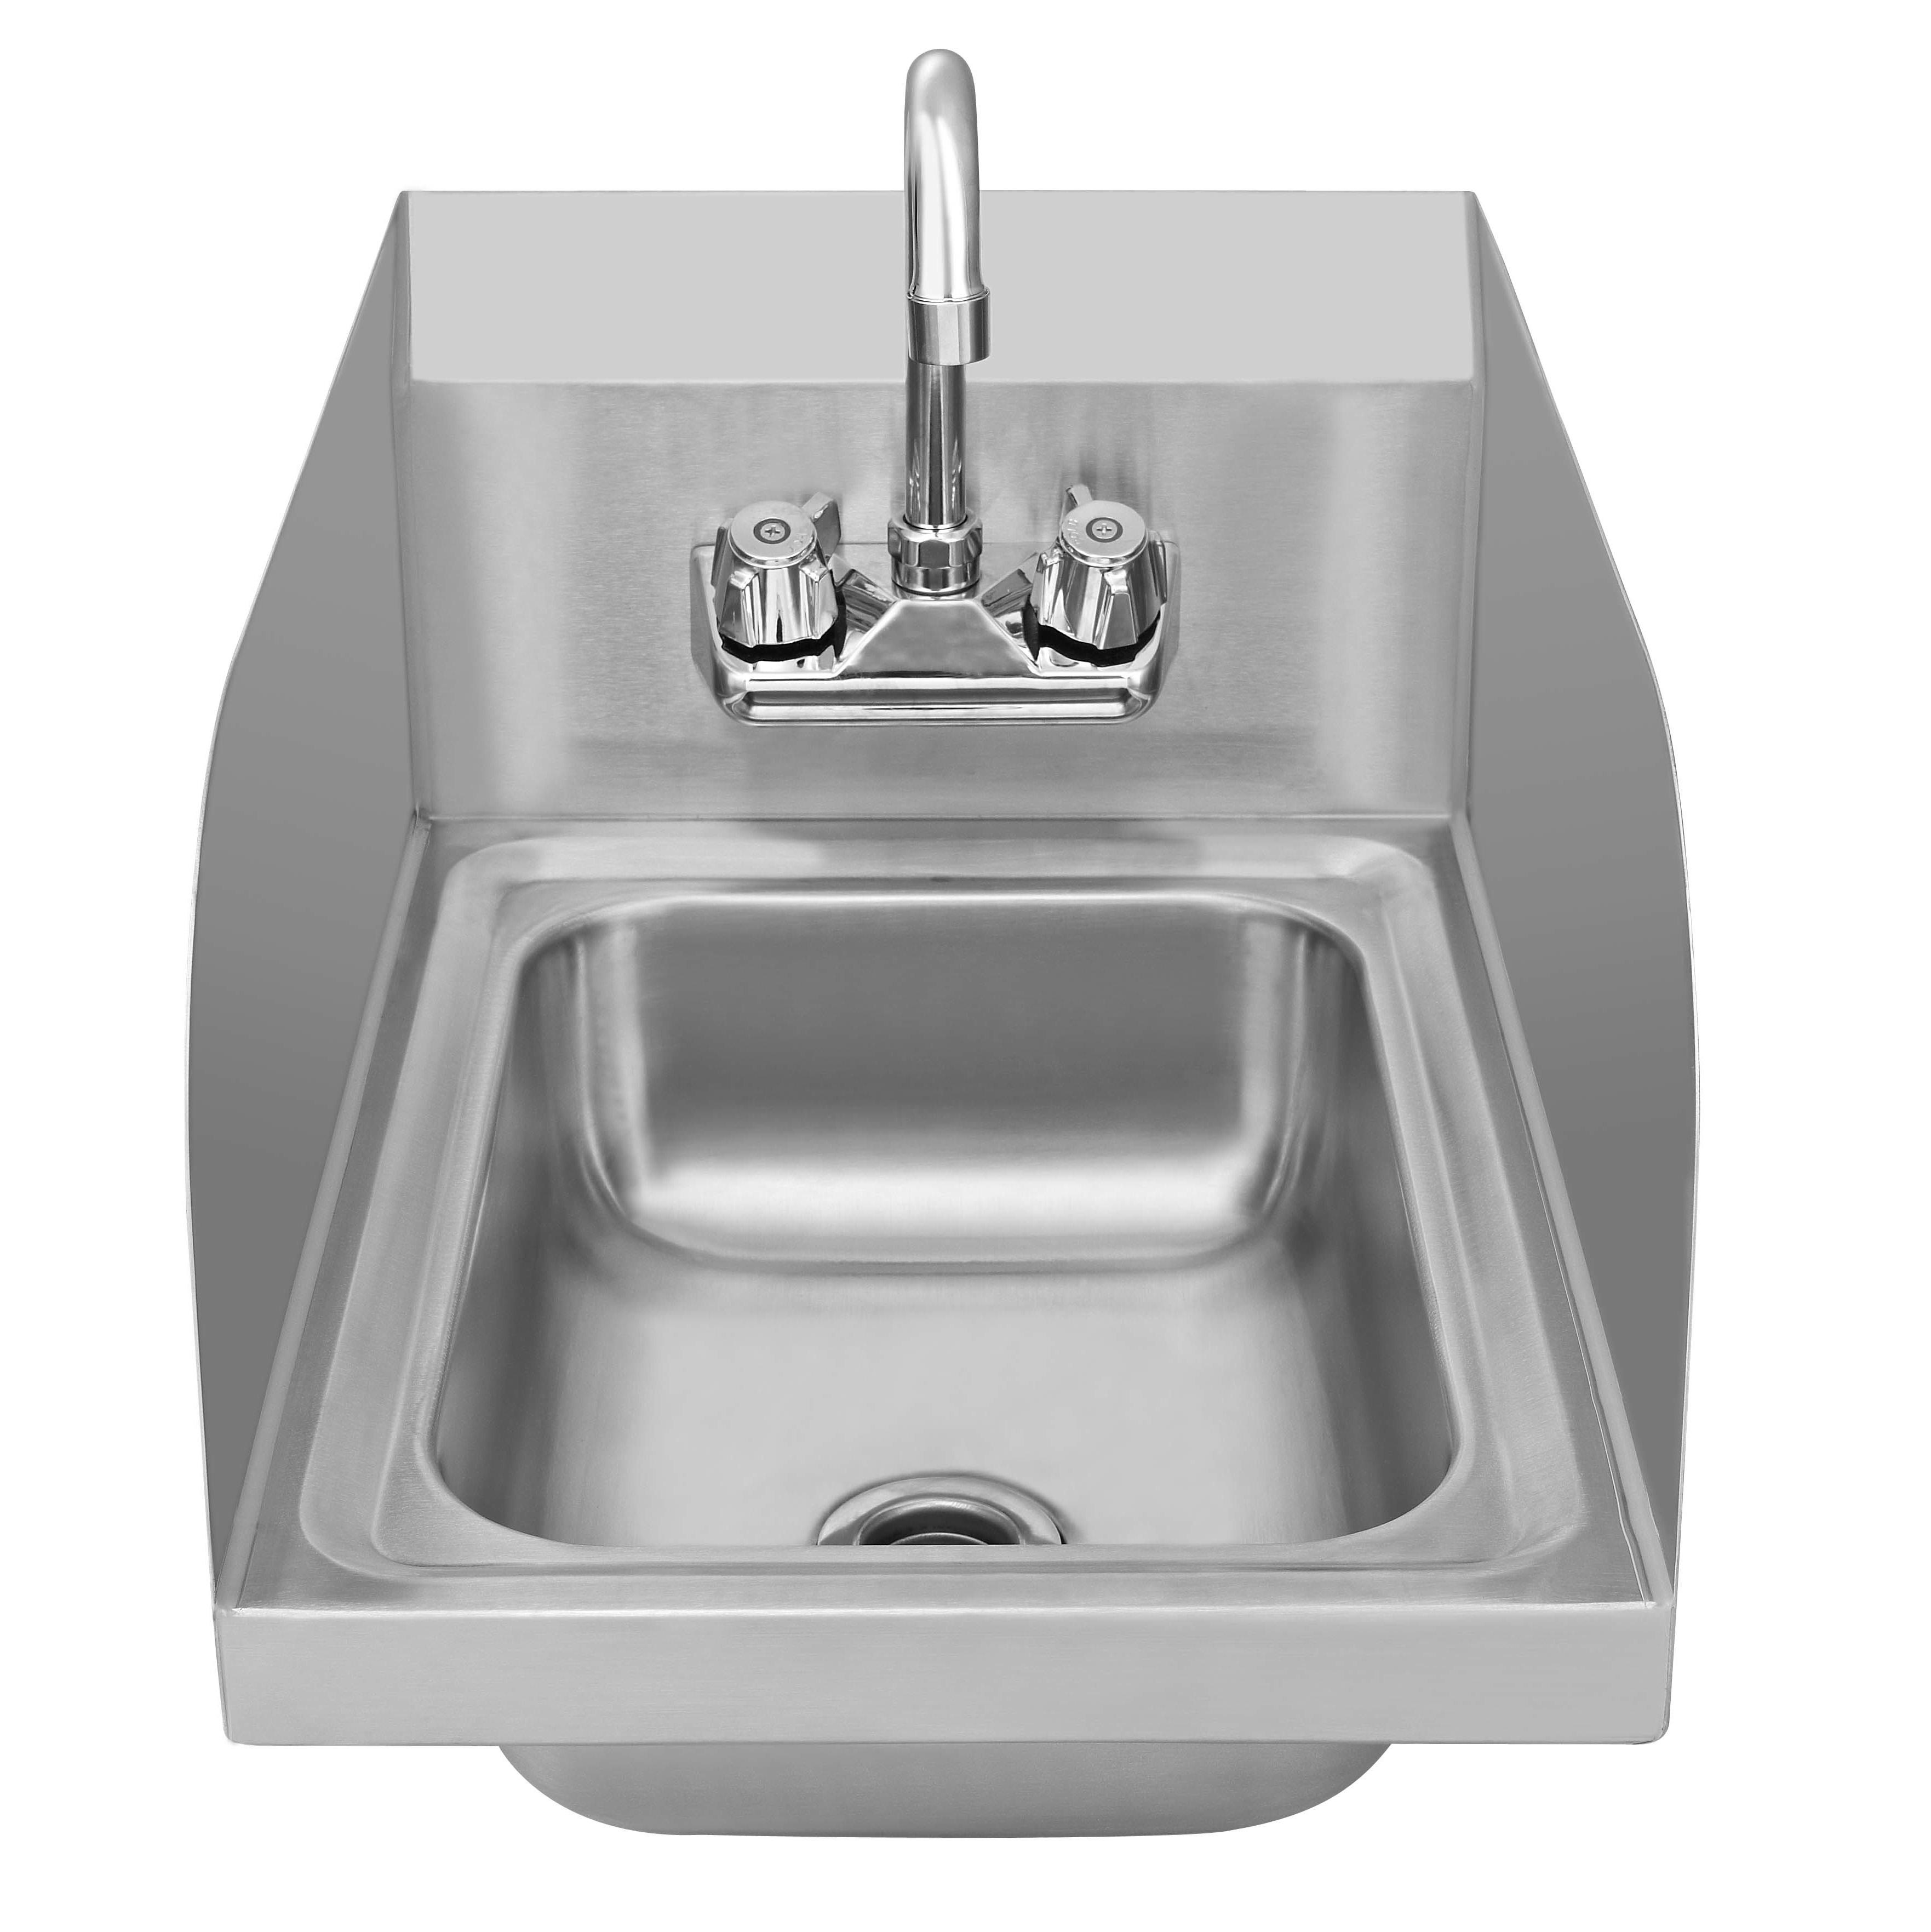 Klinger's Trading SSPHS-1000 13X19 sink, hand